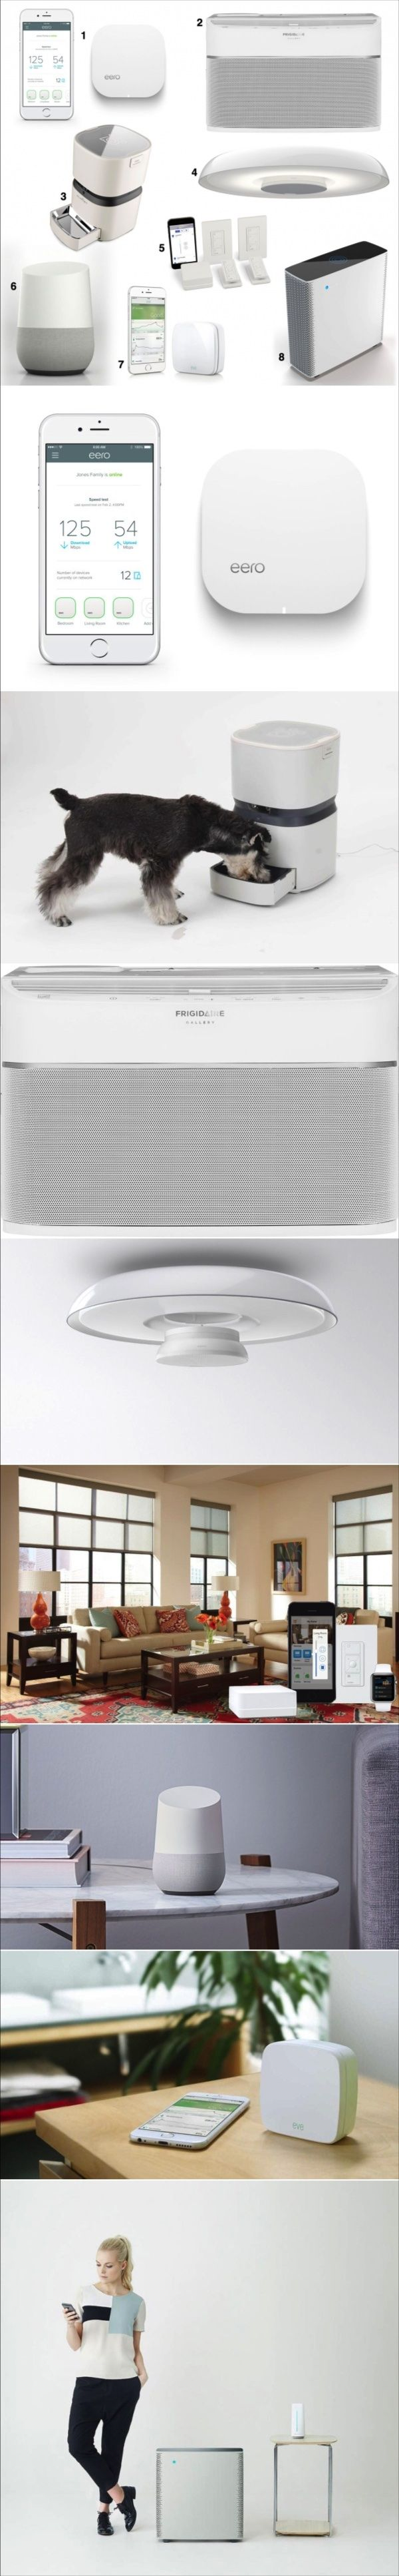 Home technology design